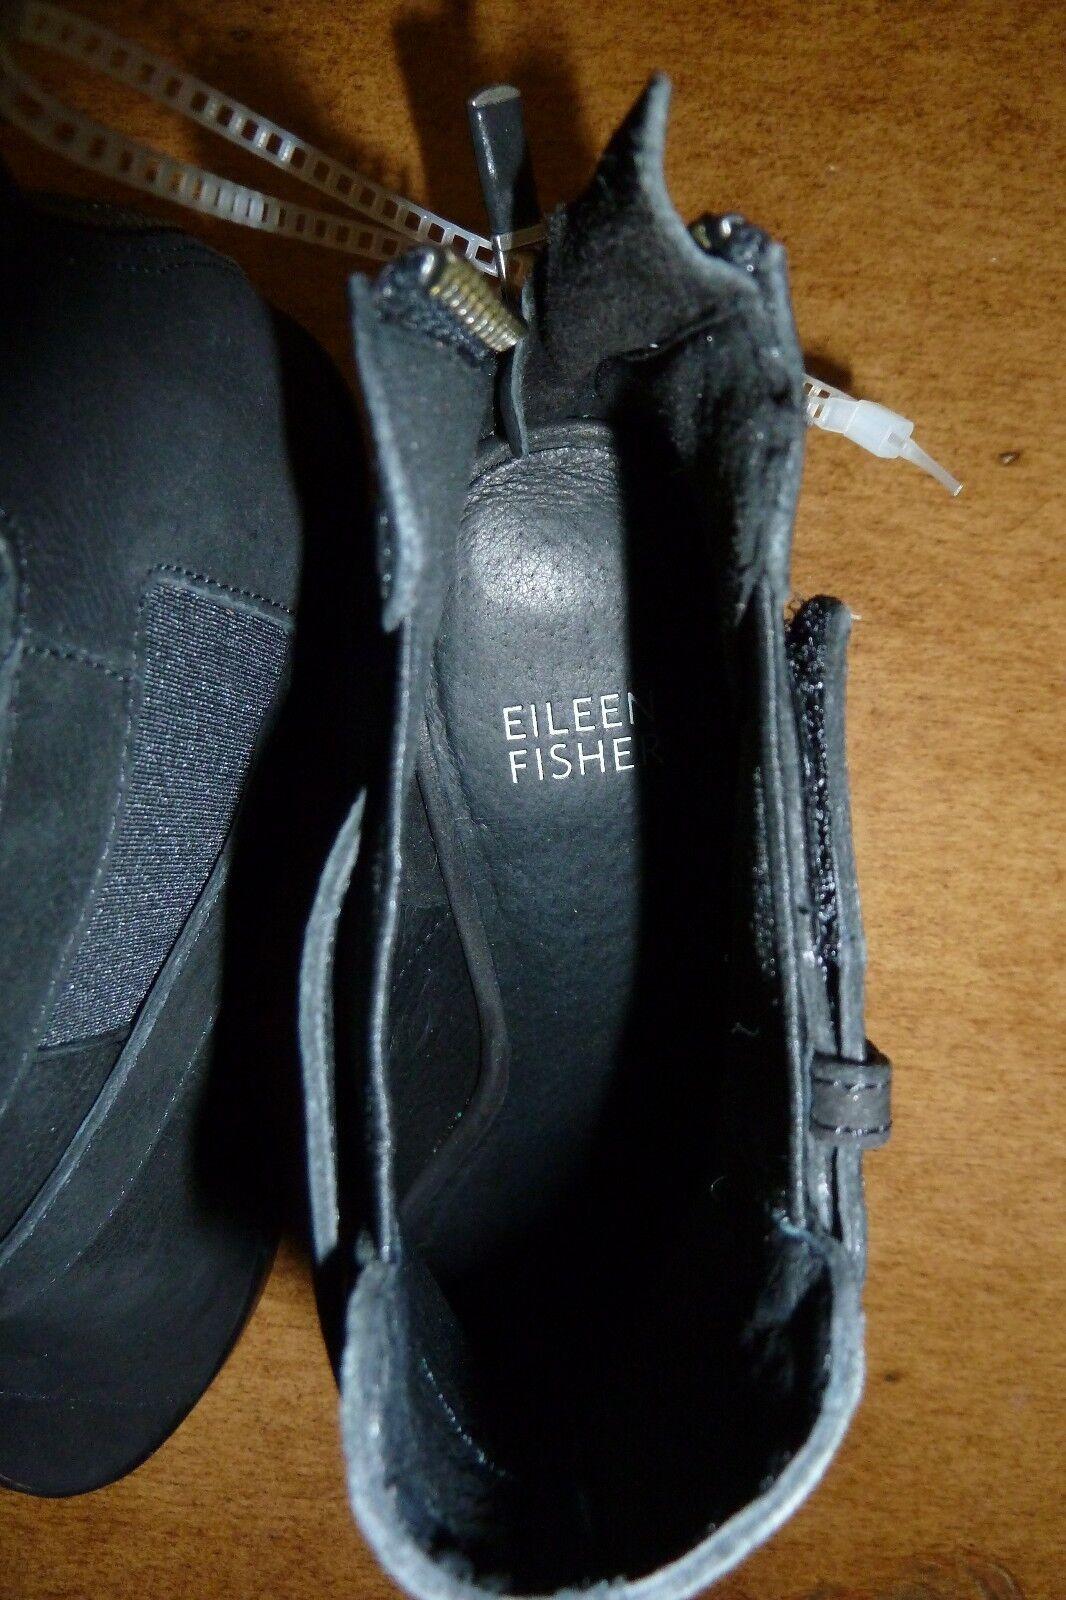 Lista nueva EILEEN FISHER Puntera Abierta Tobillo Tobillo Tobillo botas Nubuck Negro 7 93e103